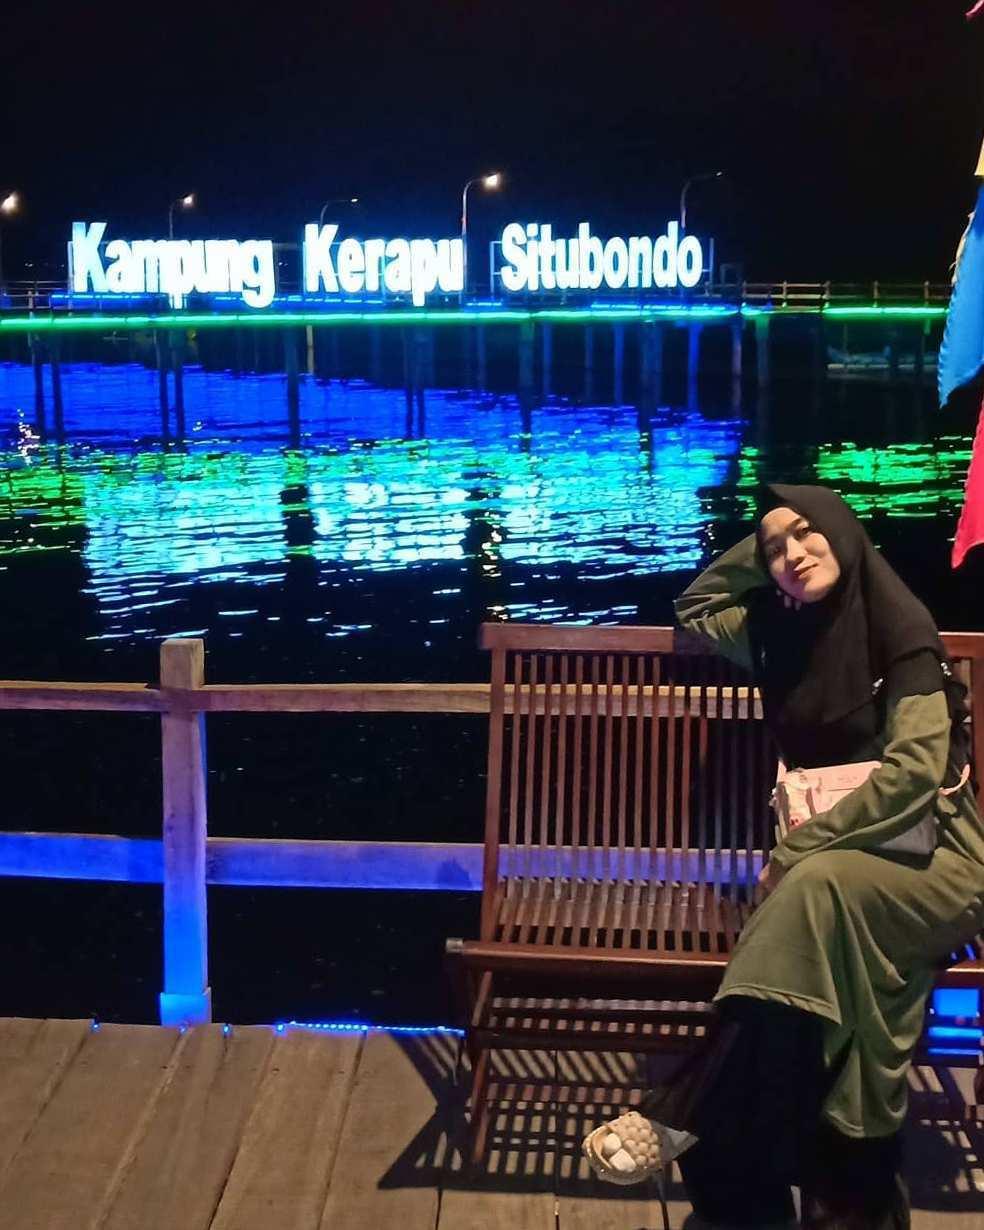 Berfoto di Kampung Kerapu Situbondo Pada Malam Hari, Image From @ima_mozha